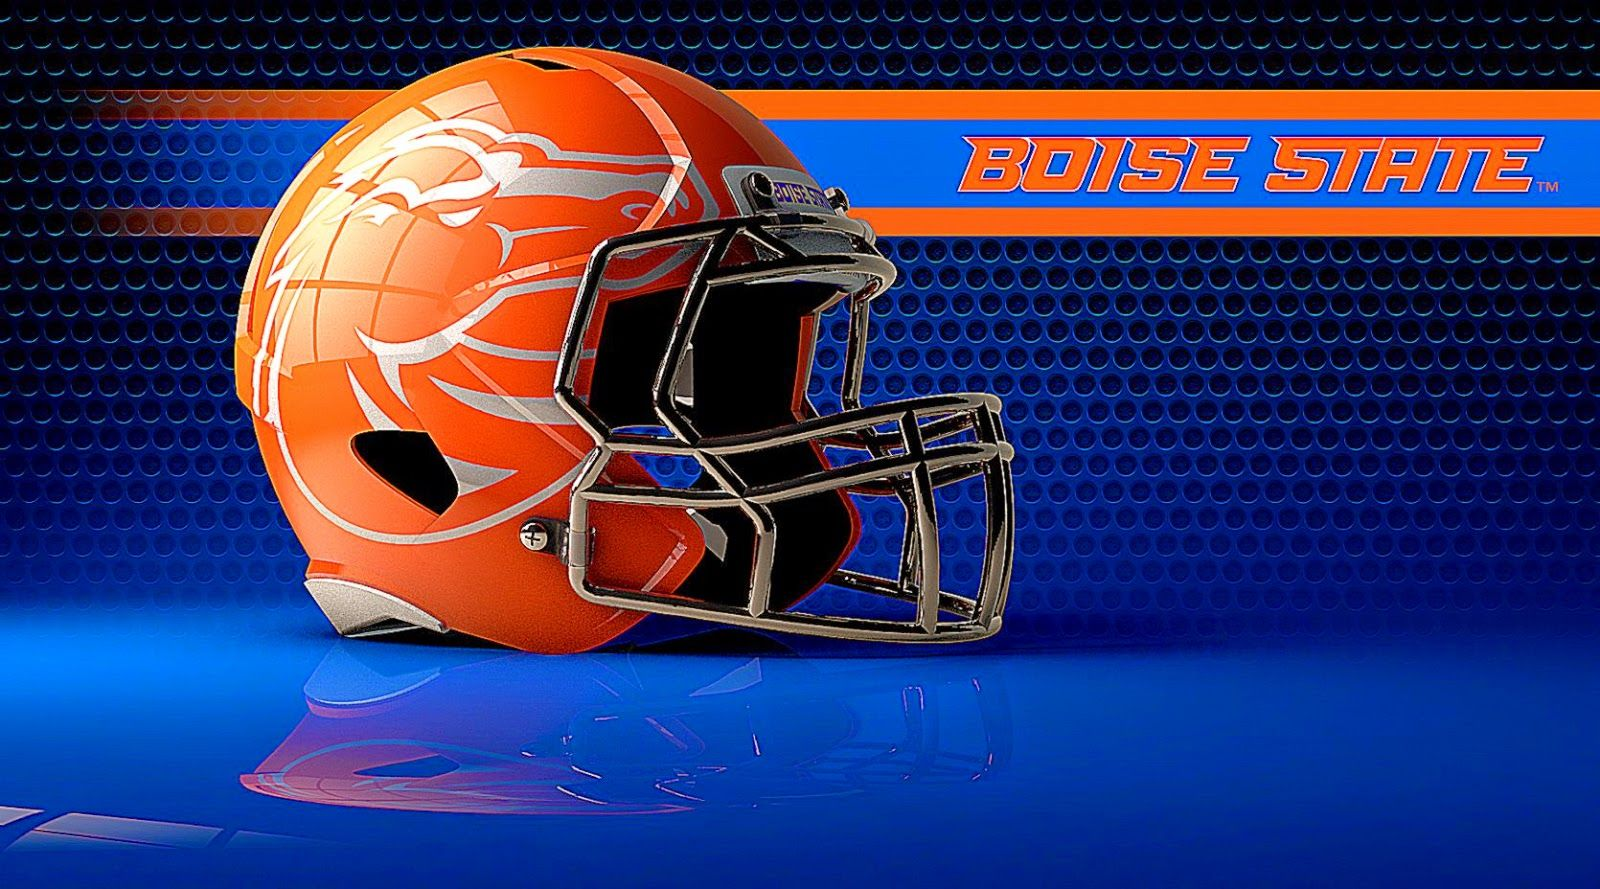 boise state wallpaper  Kellen Moore Autographed/signed Boise State Broncos Mini Helmet W ...